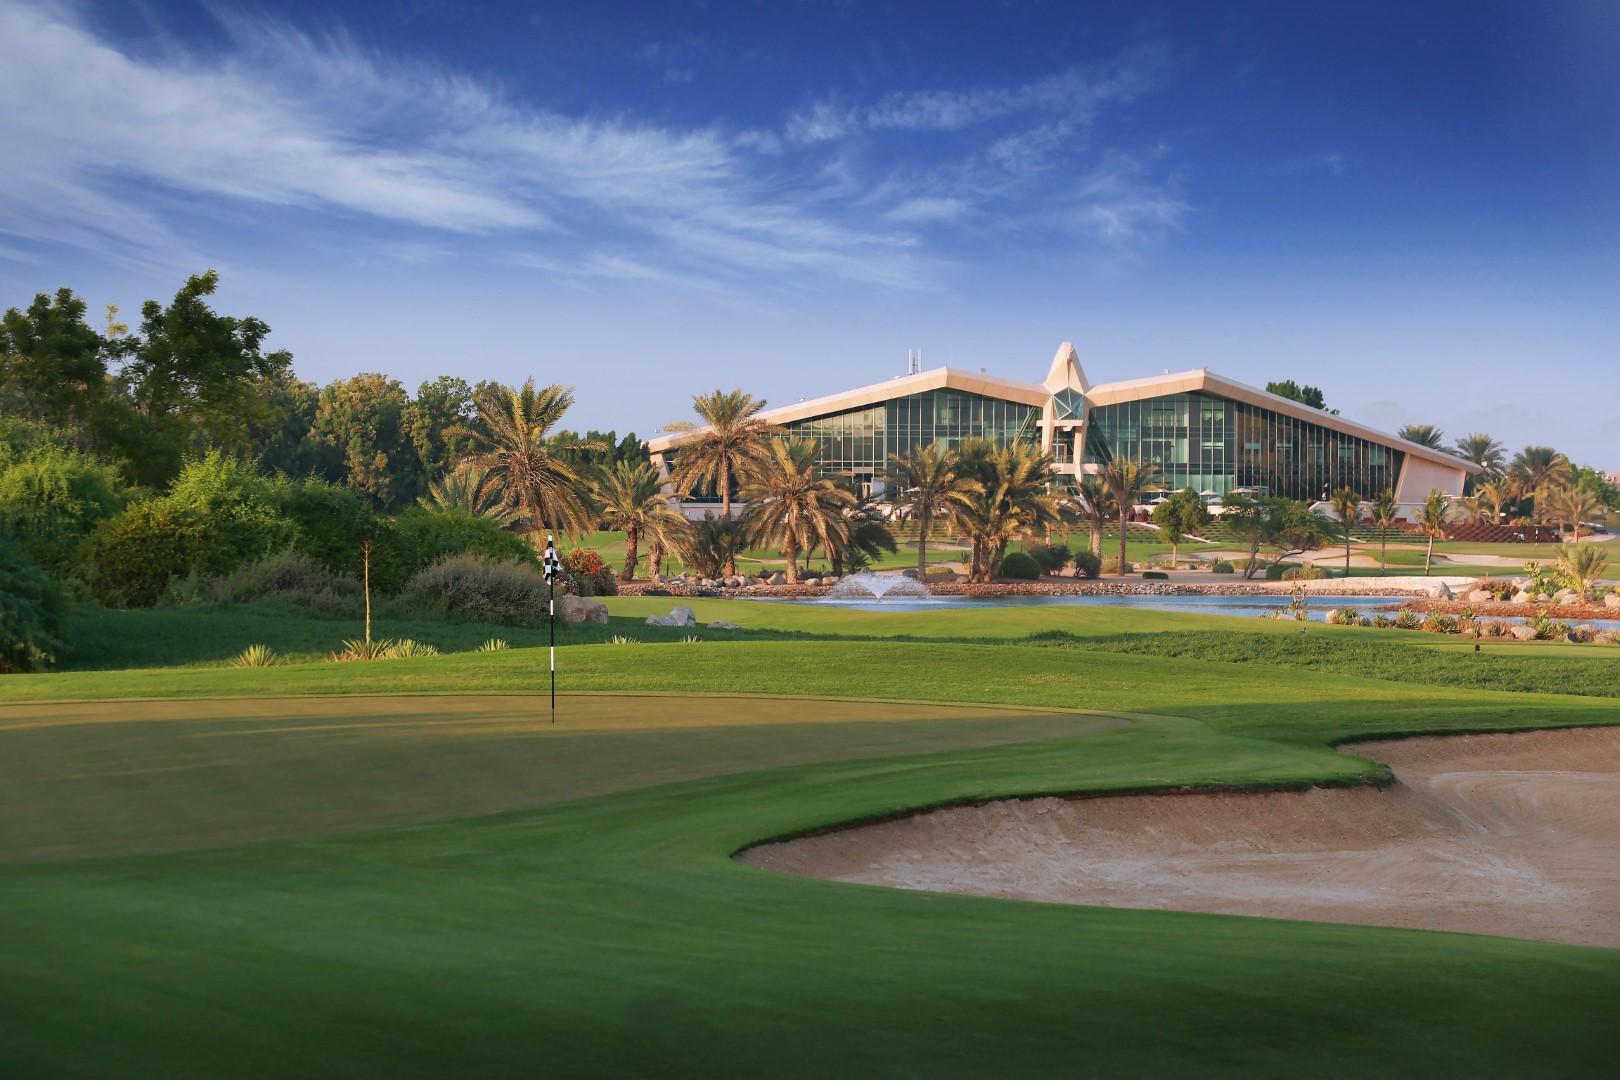 Abu Dhabi golf cours